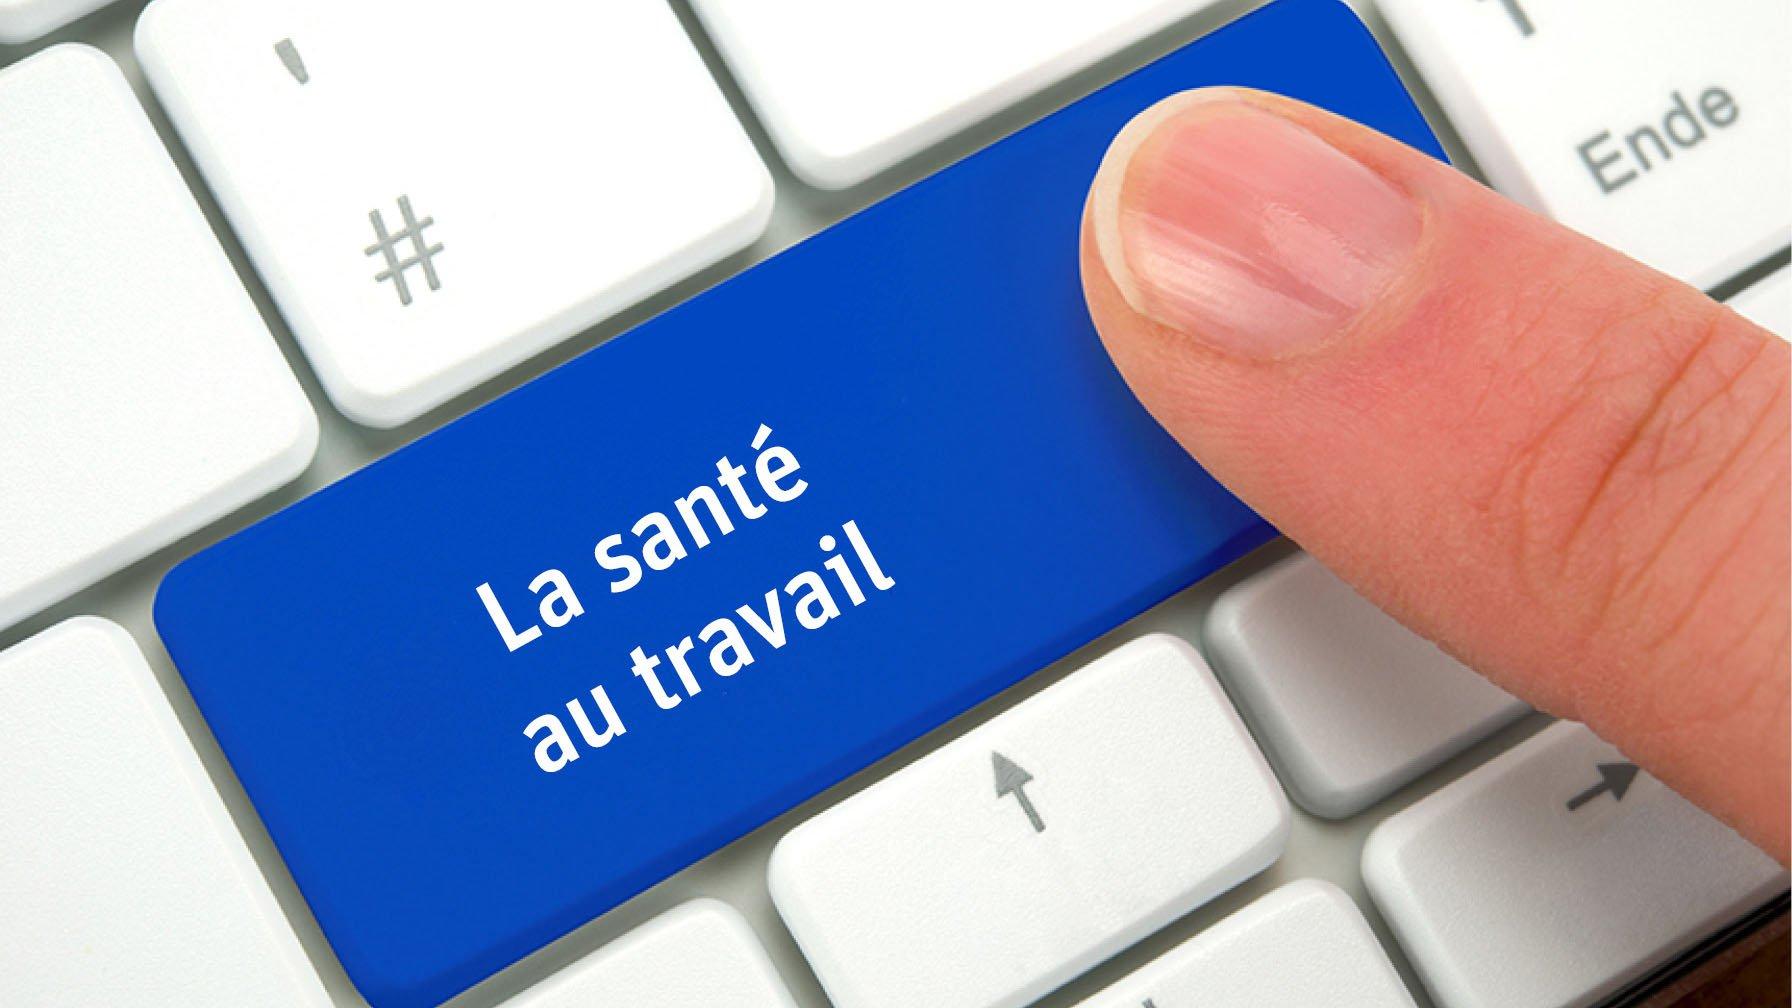 LaSanté_au_travail_Startseite